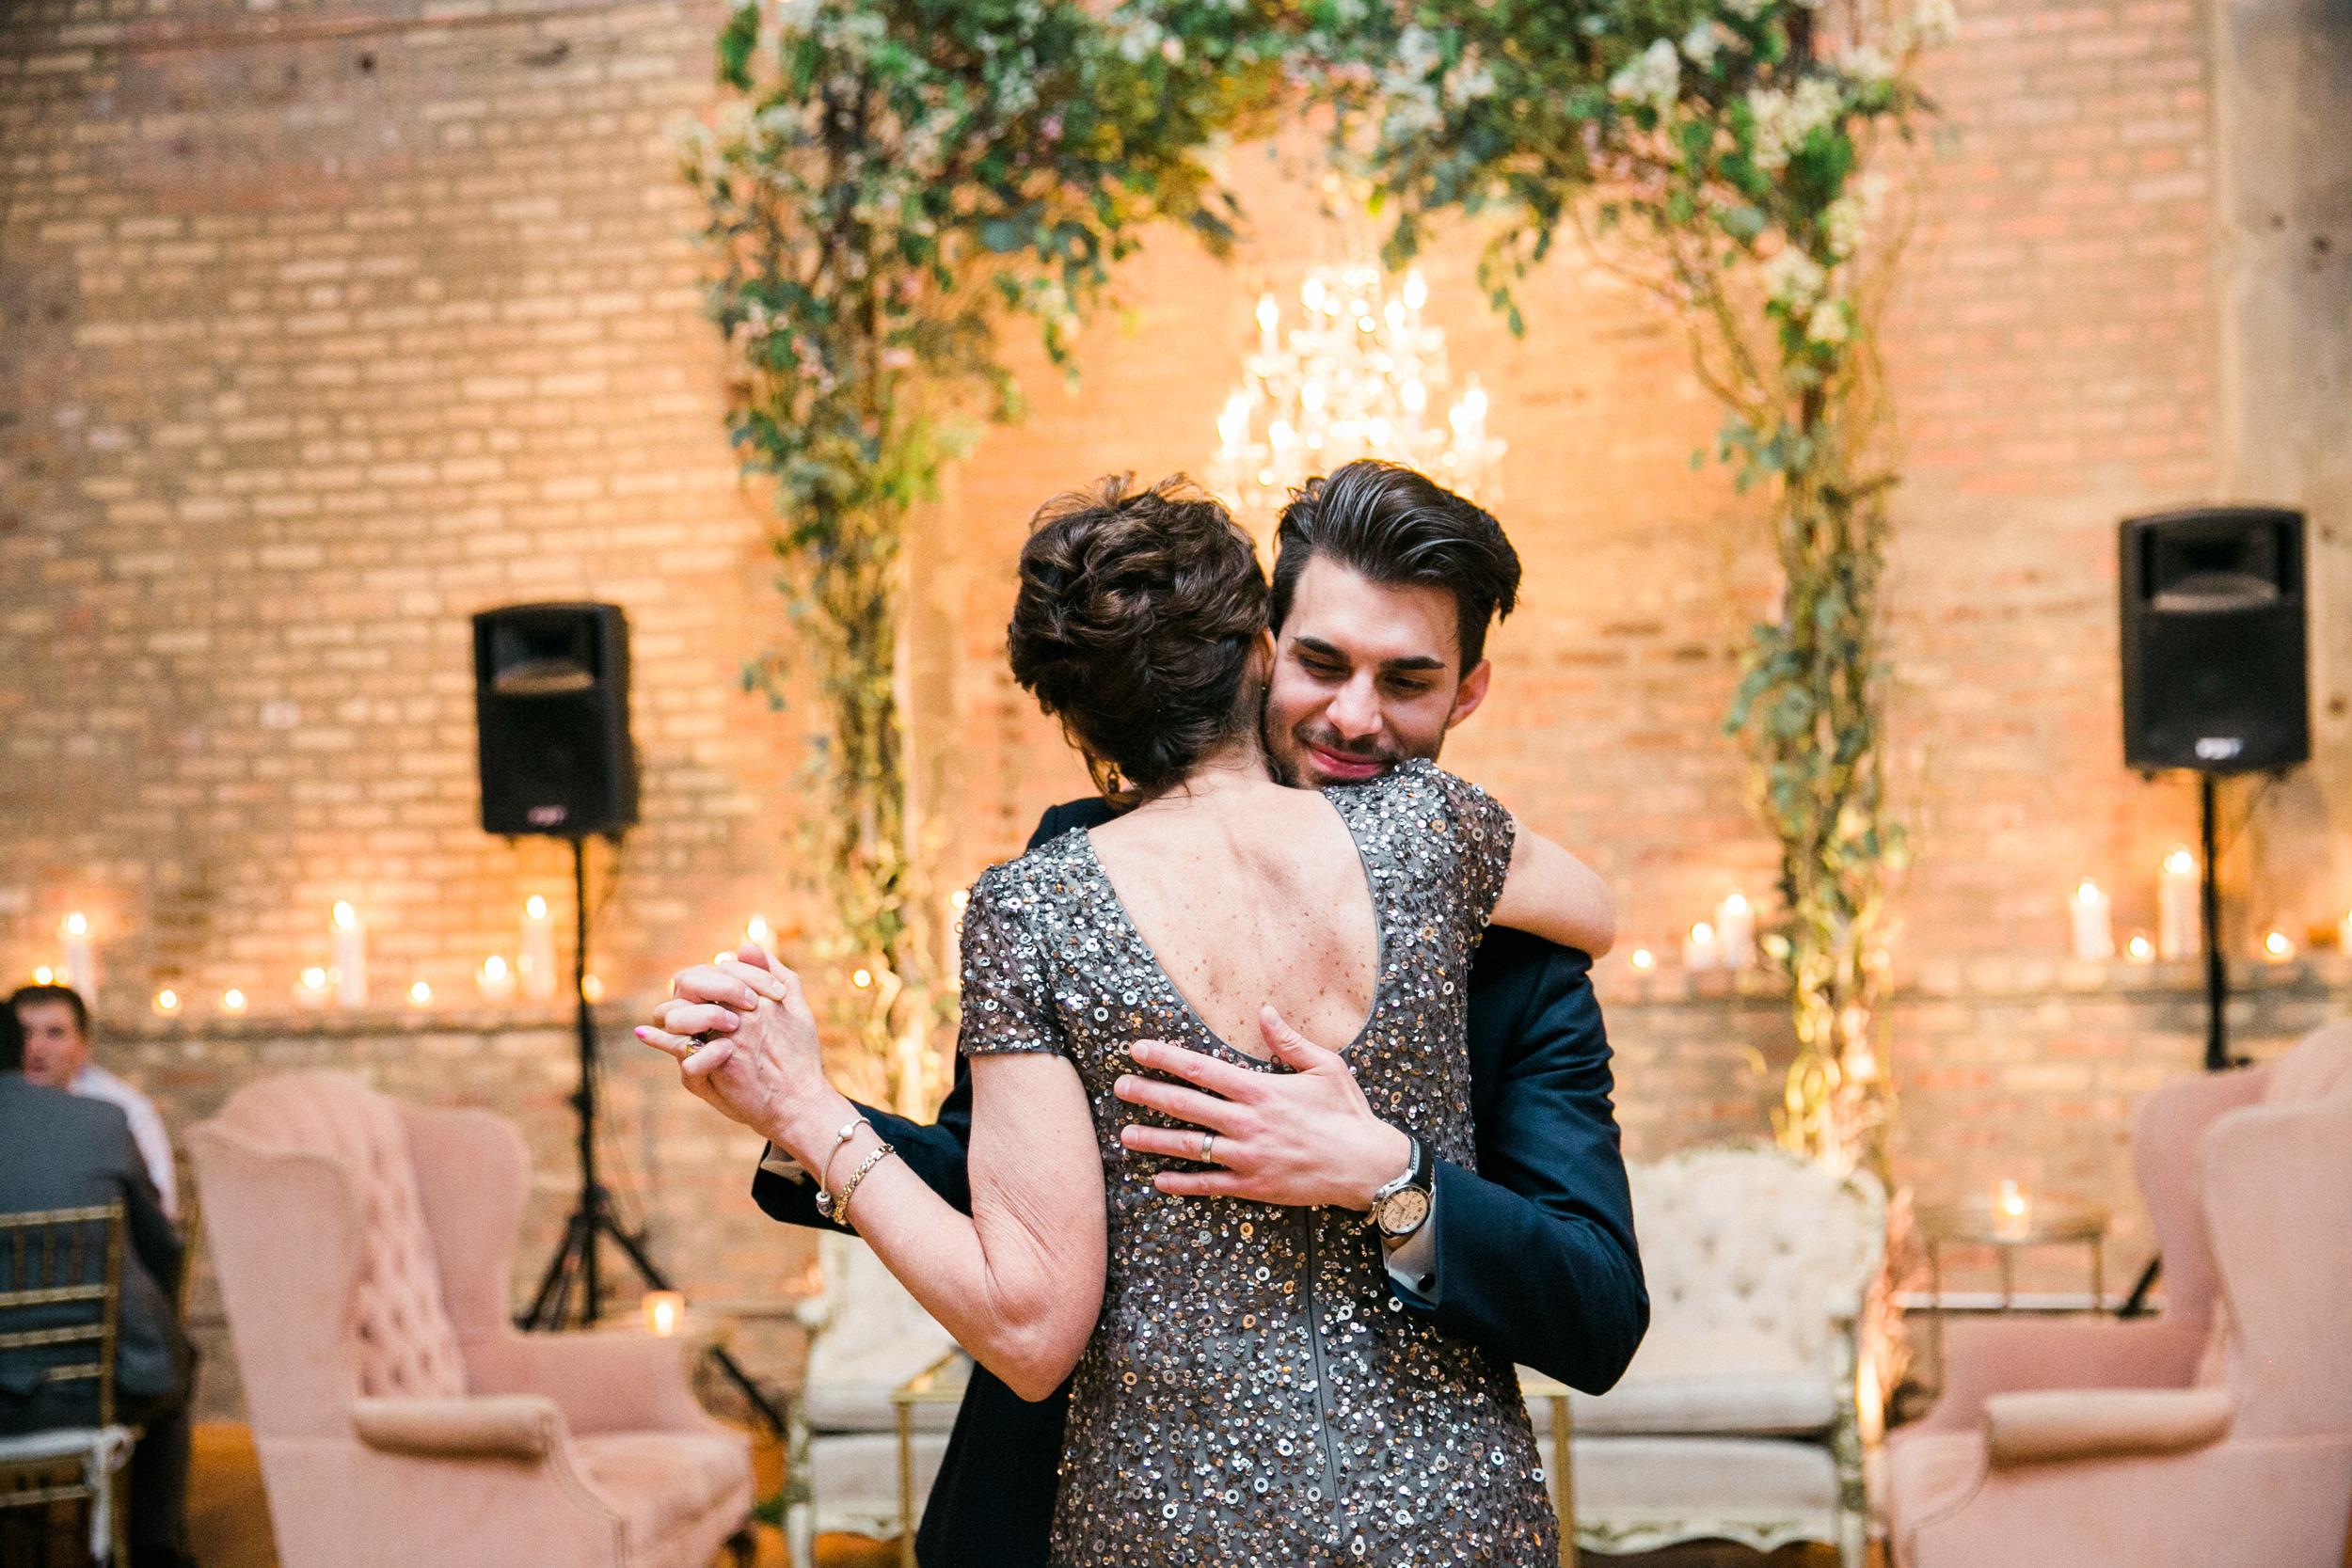 mayden_photography_weddings-146.jpg